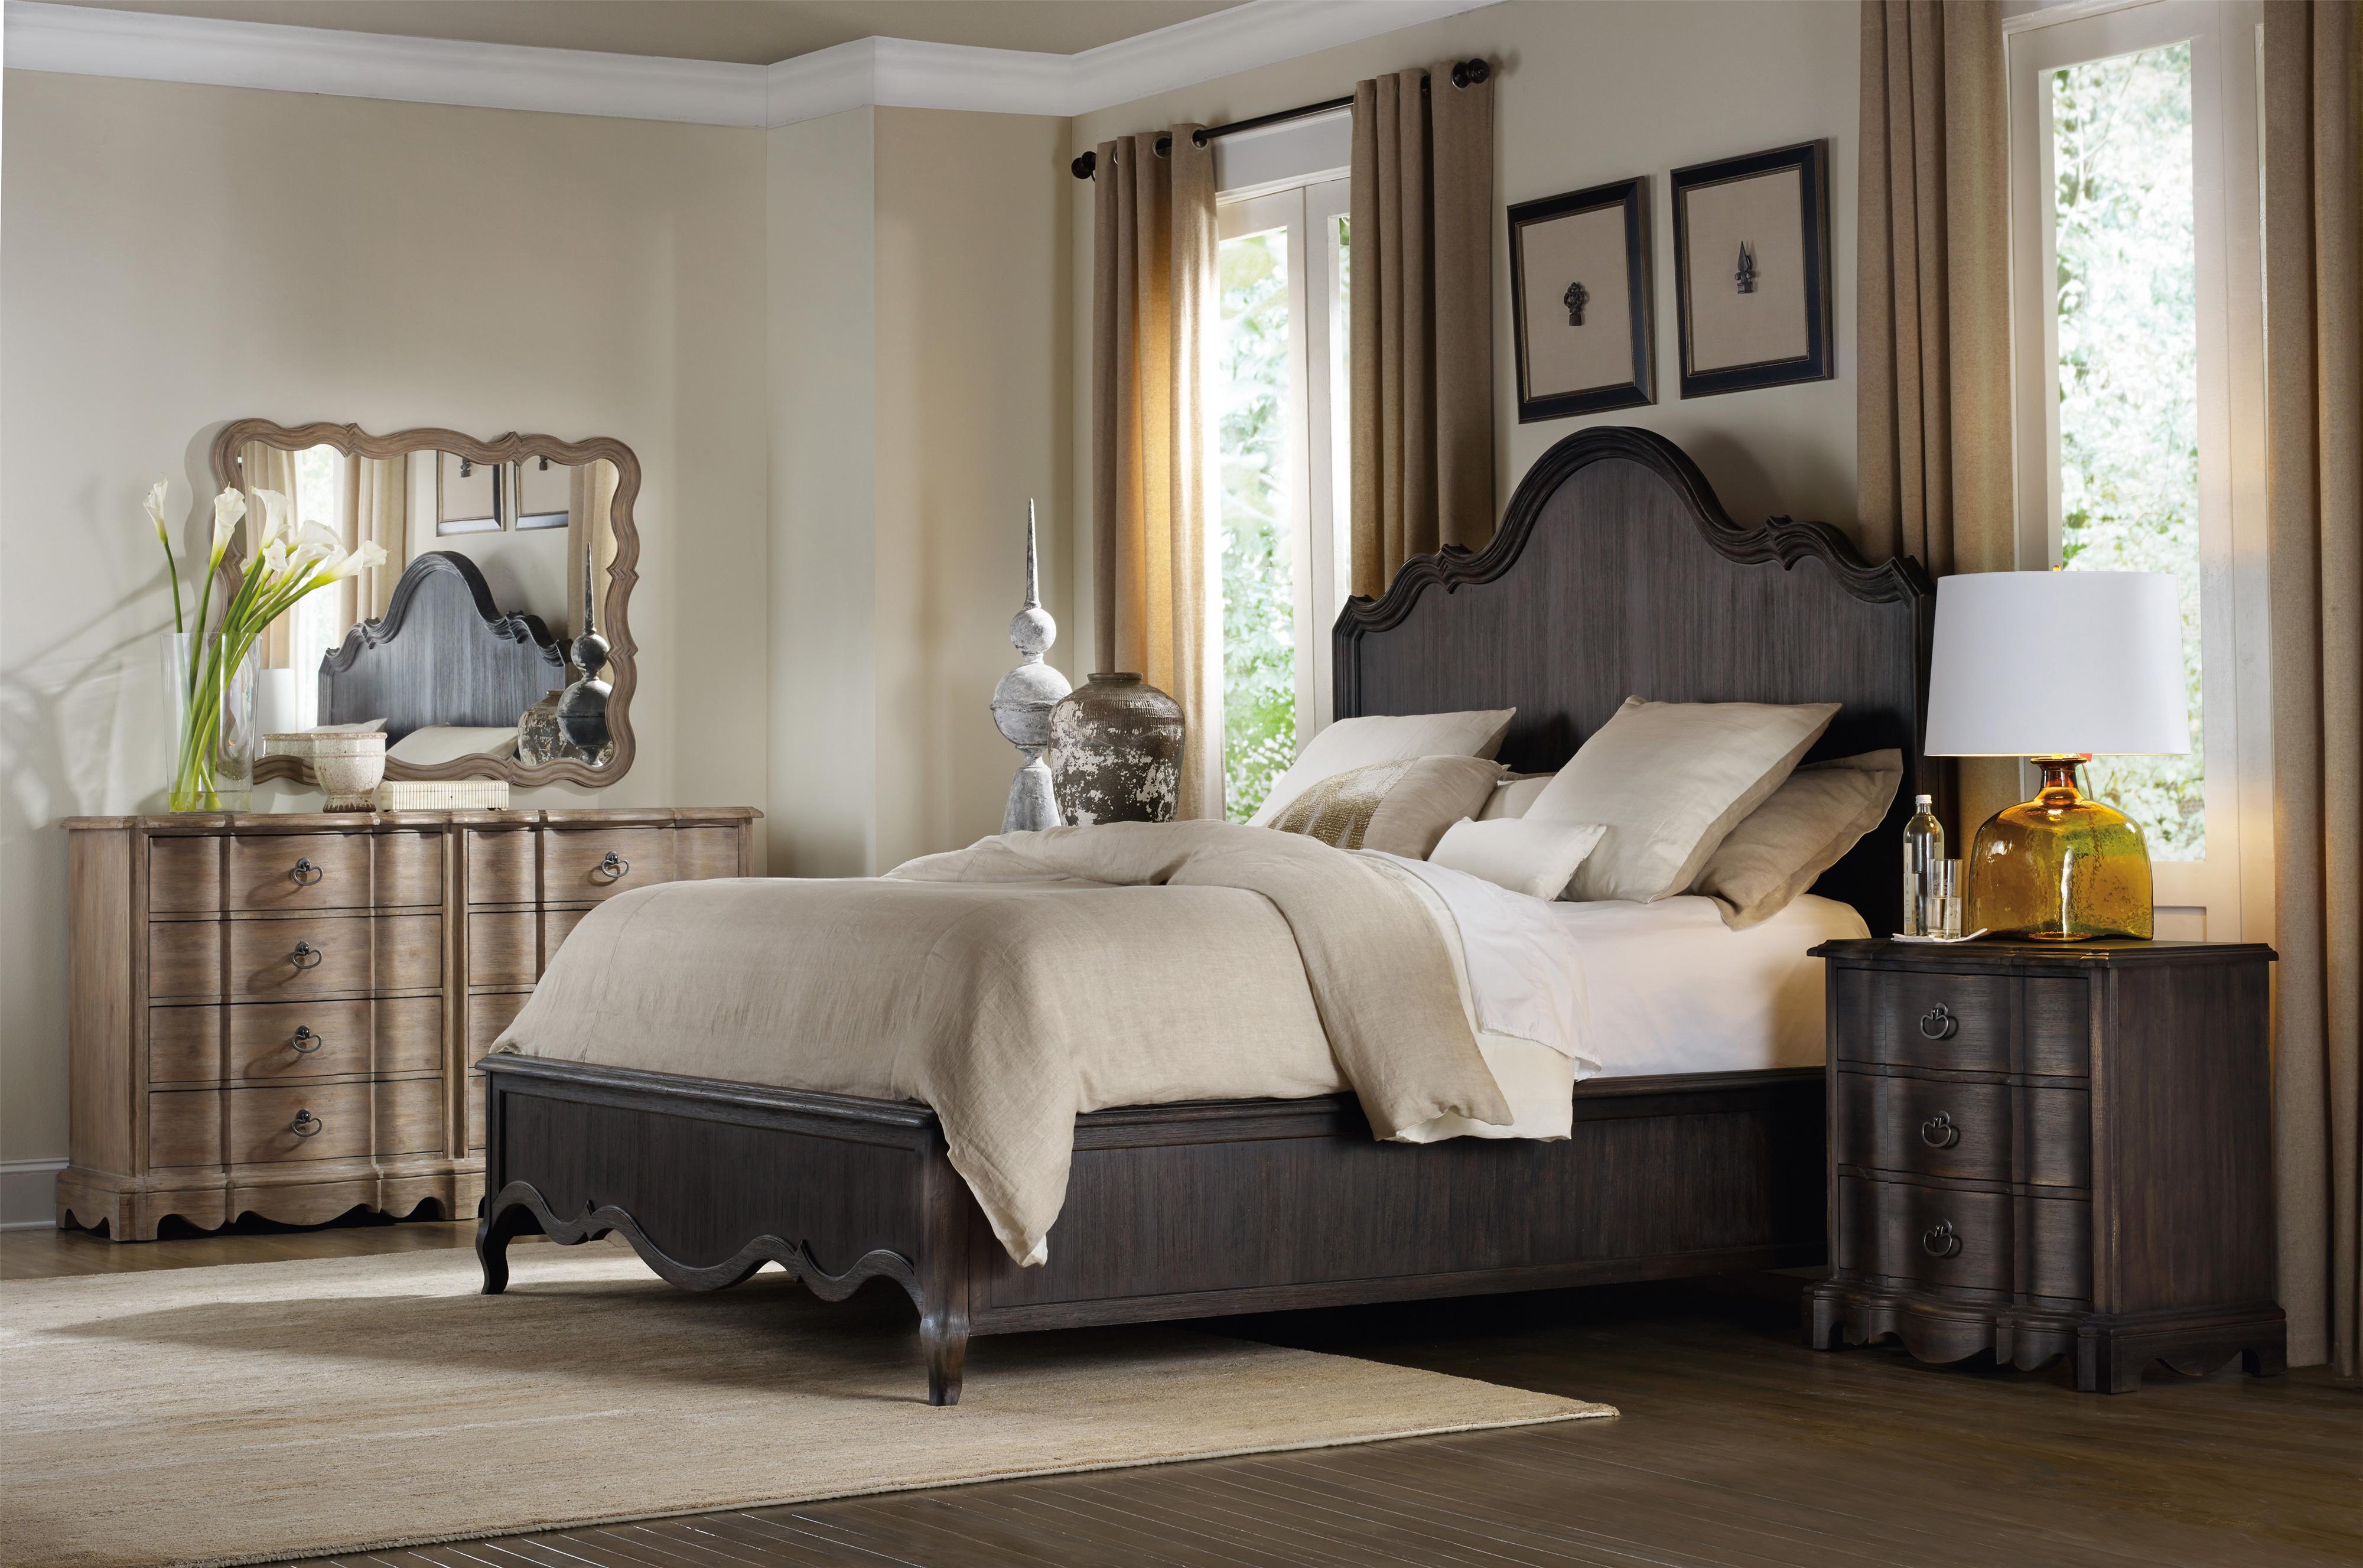 Corsica King Panel Bedroom Group by Hooker Furniture at Pedigo Furniture